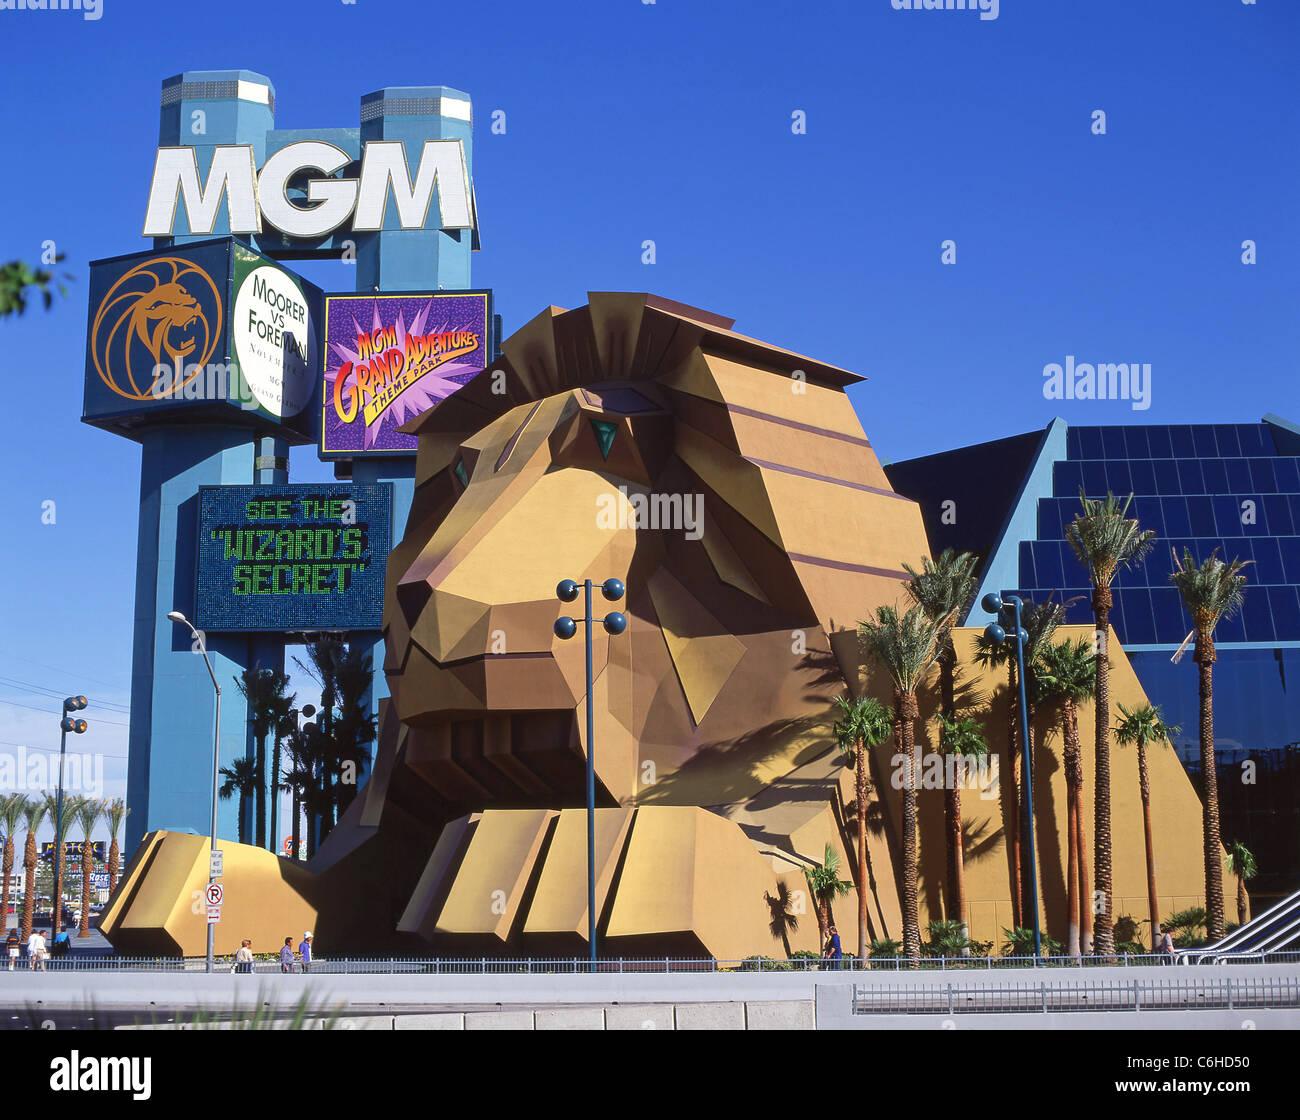 Mgm Grand Hotel Casino Lowen Eingang Vegas Strip Las Vegas Nevada Vereinigte Staaten Von Amerika Stockfotografie Alamy